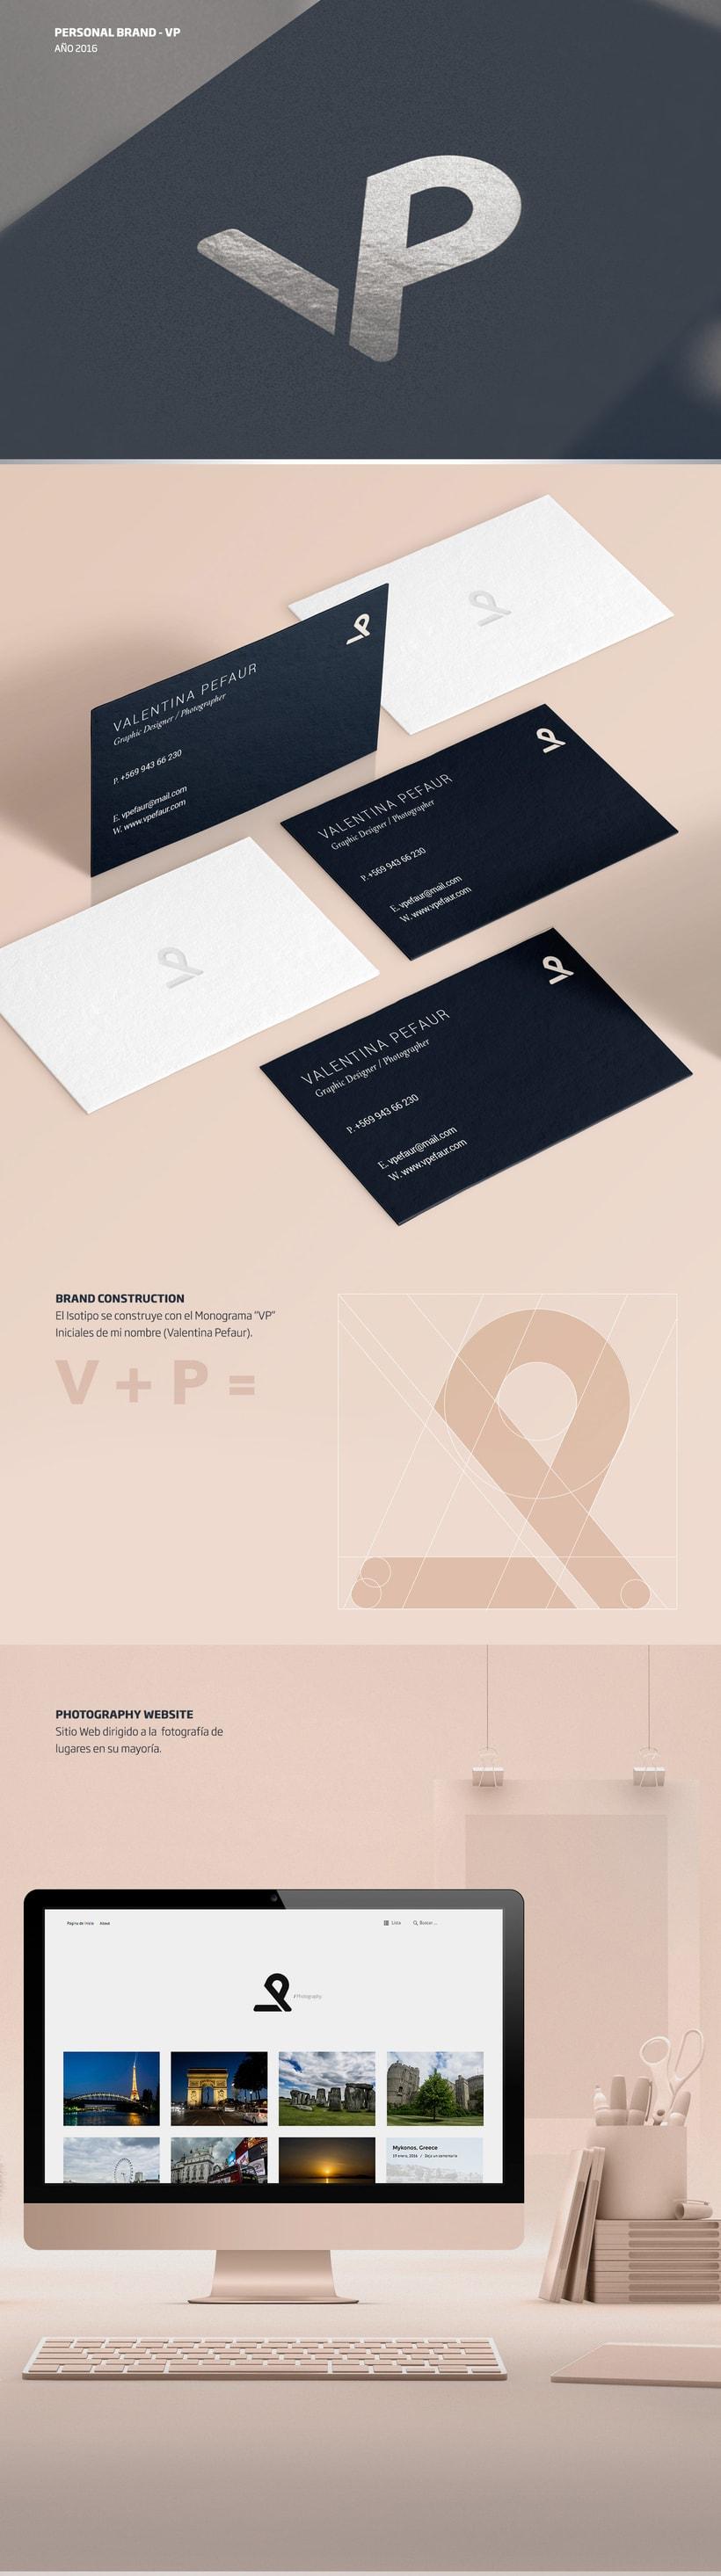 VP - Personal Branding 0